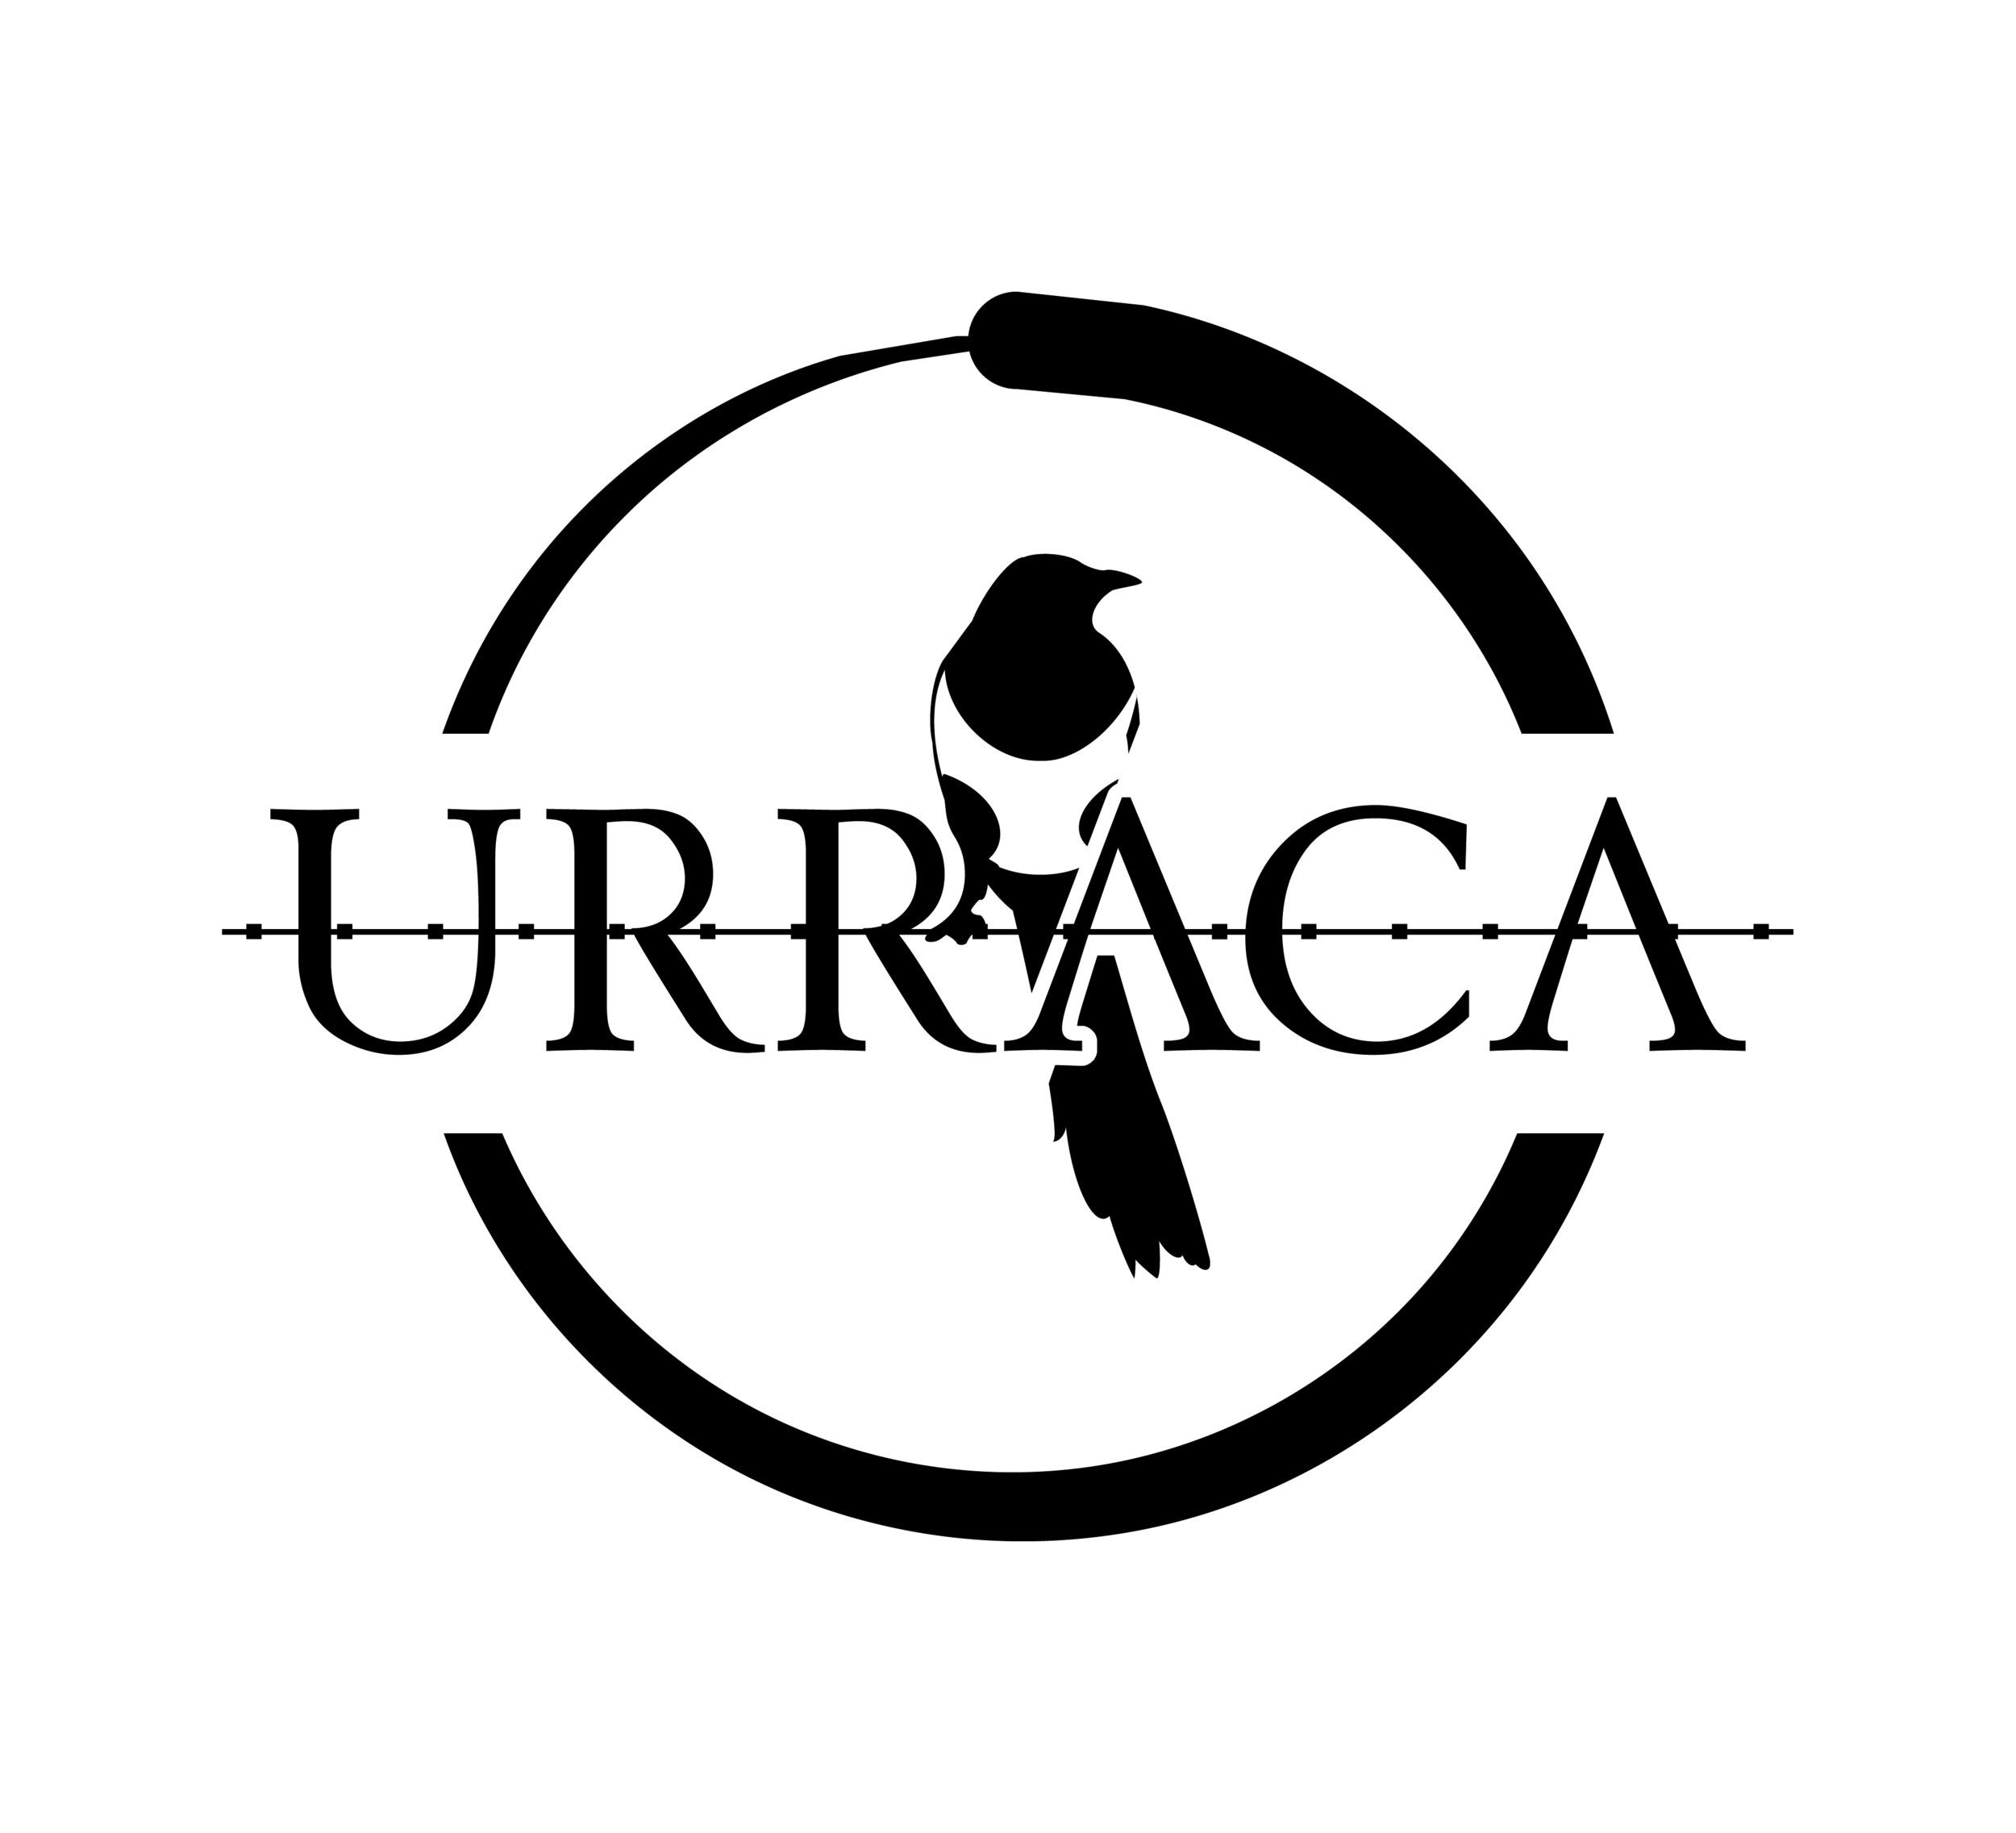 marca_urraca_alta